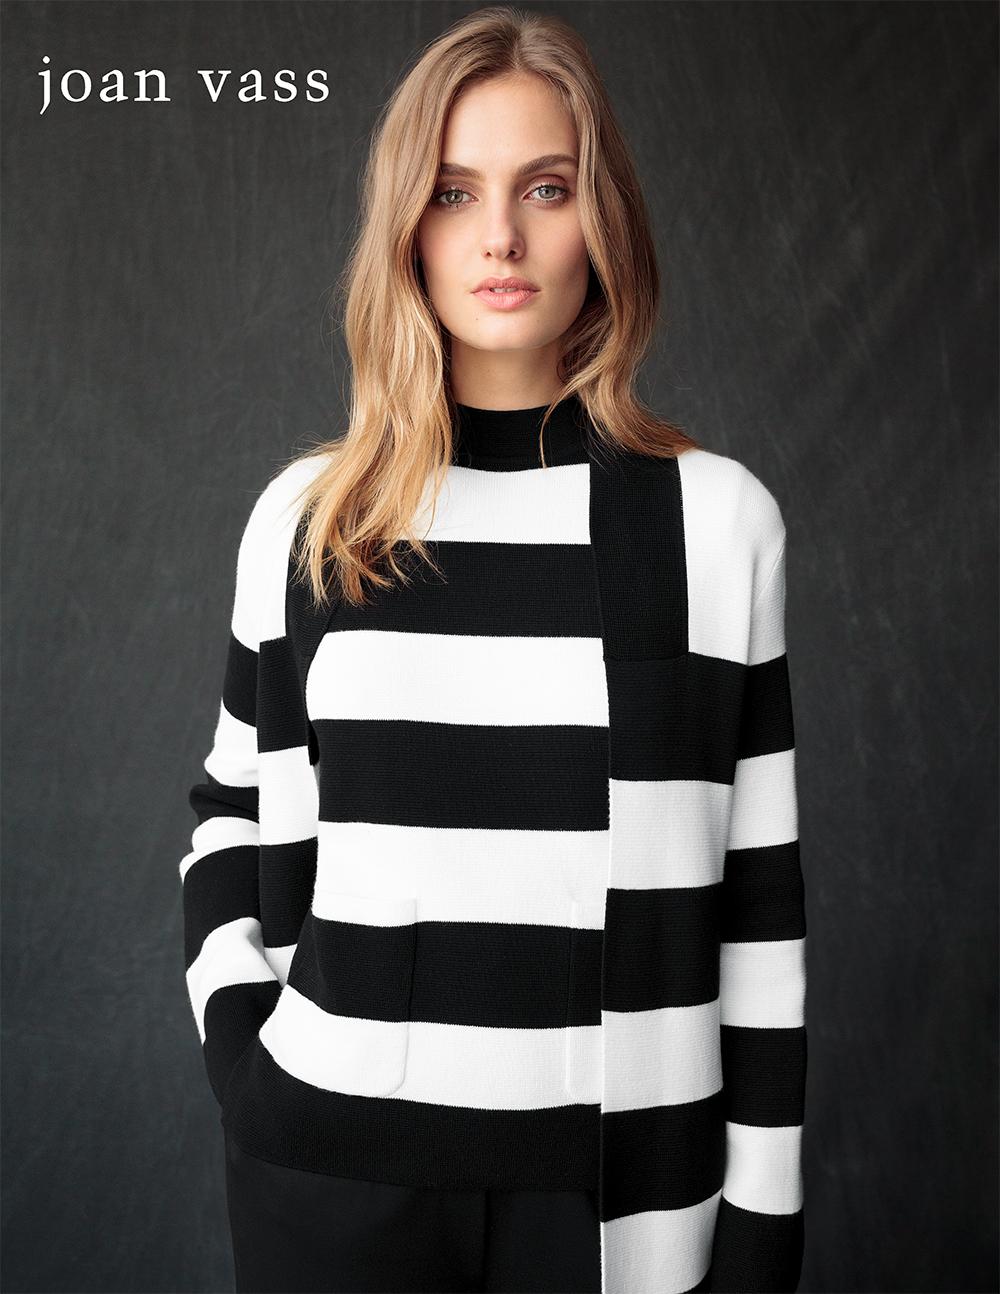 new-york-fashion-photographer-melis-dainon-joan-vass-campaign-marta-bez_3.jpg